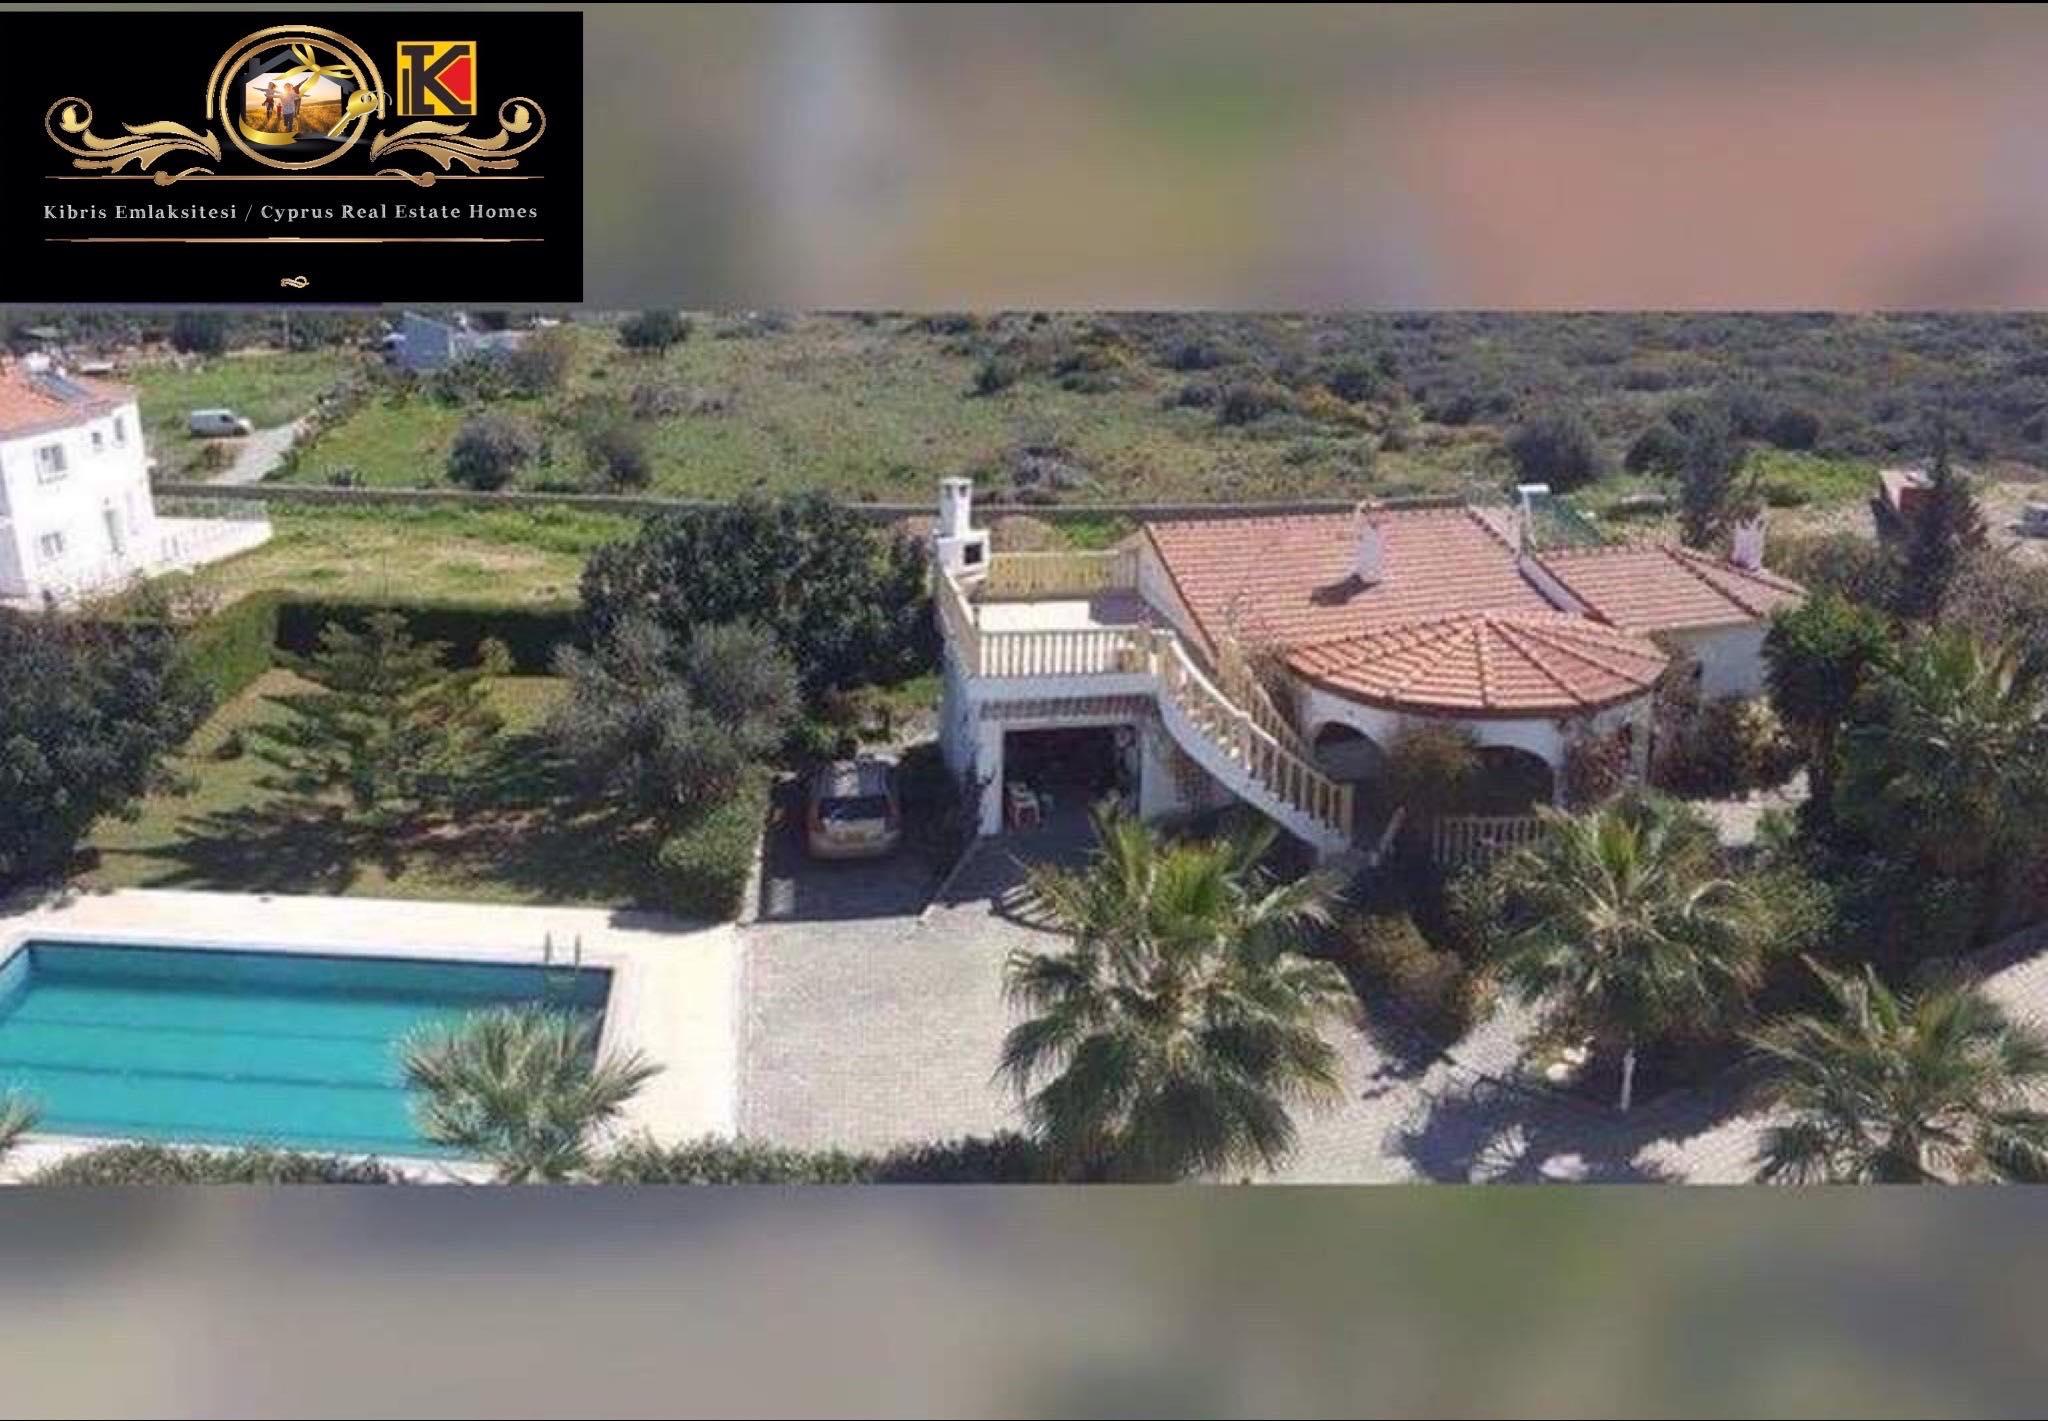 3 Bedrooms Lovely Villa For Rent Location Near Escape Beach Alsancak Girne(Private Swimming Pool)